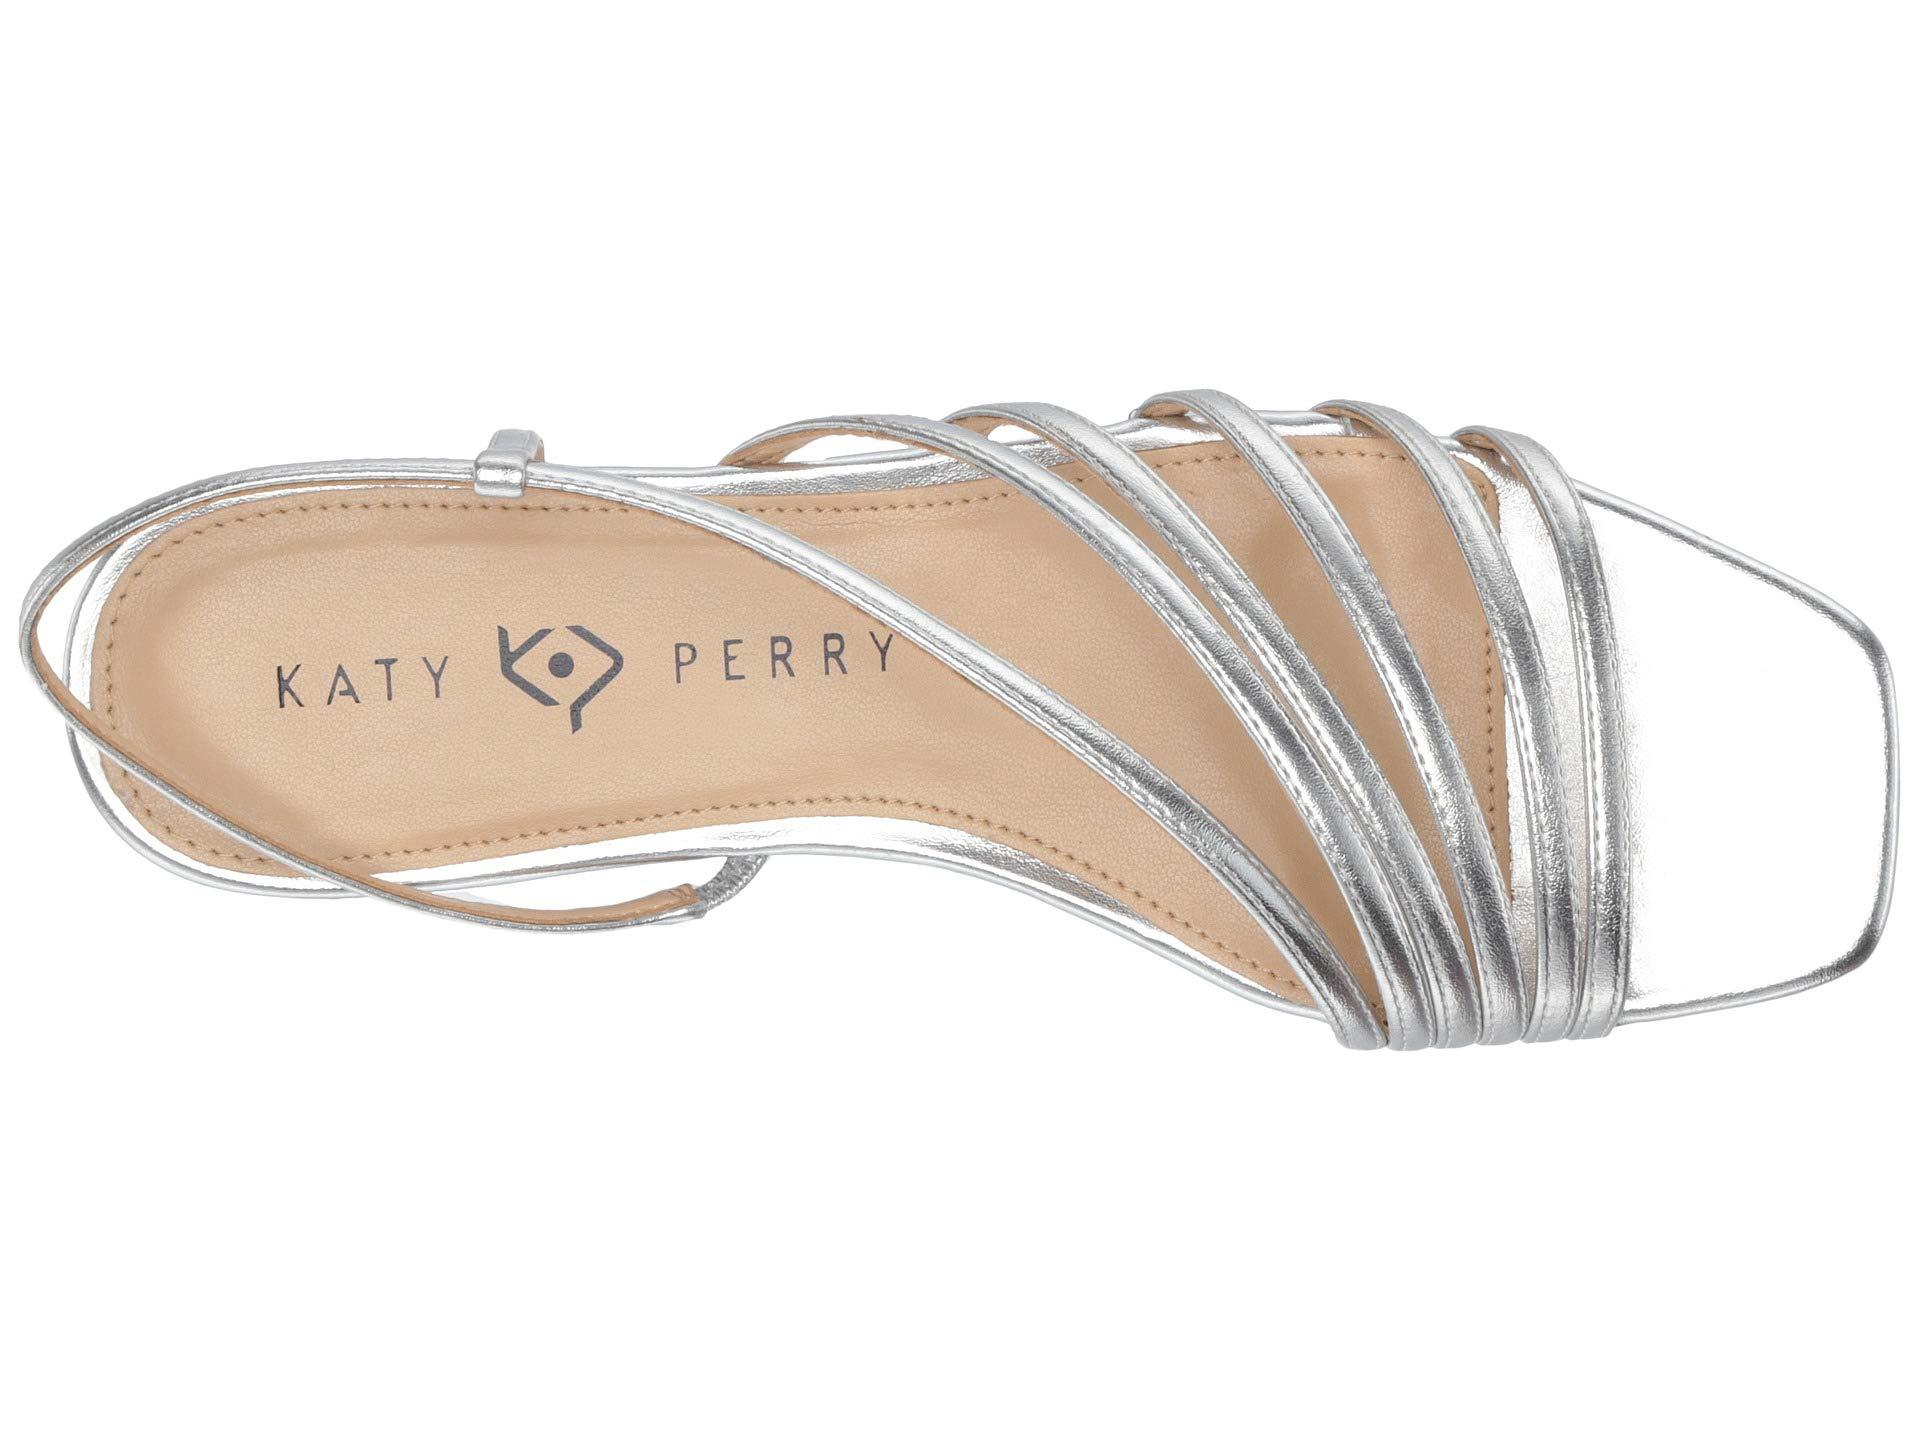 Katy Pearla Metallic The Perry Silver Shine qS6Pqrzw